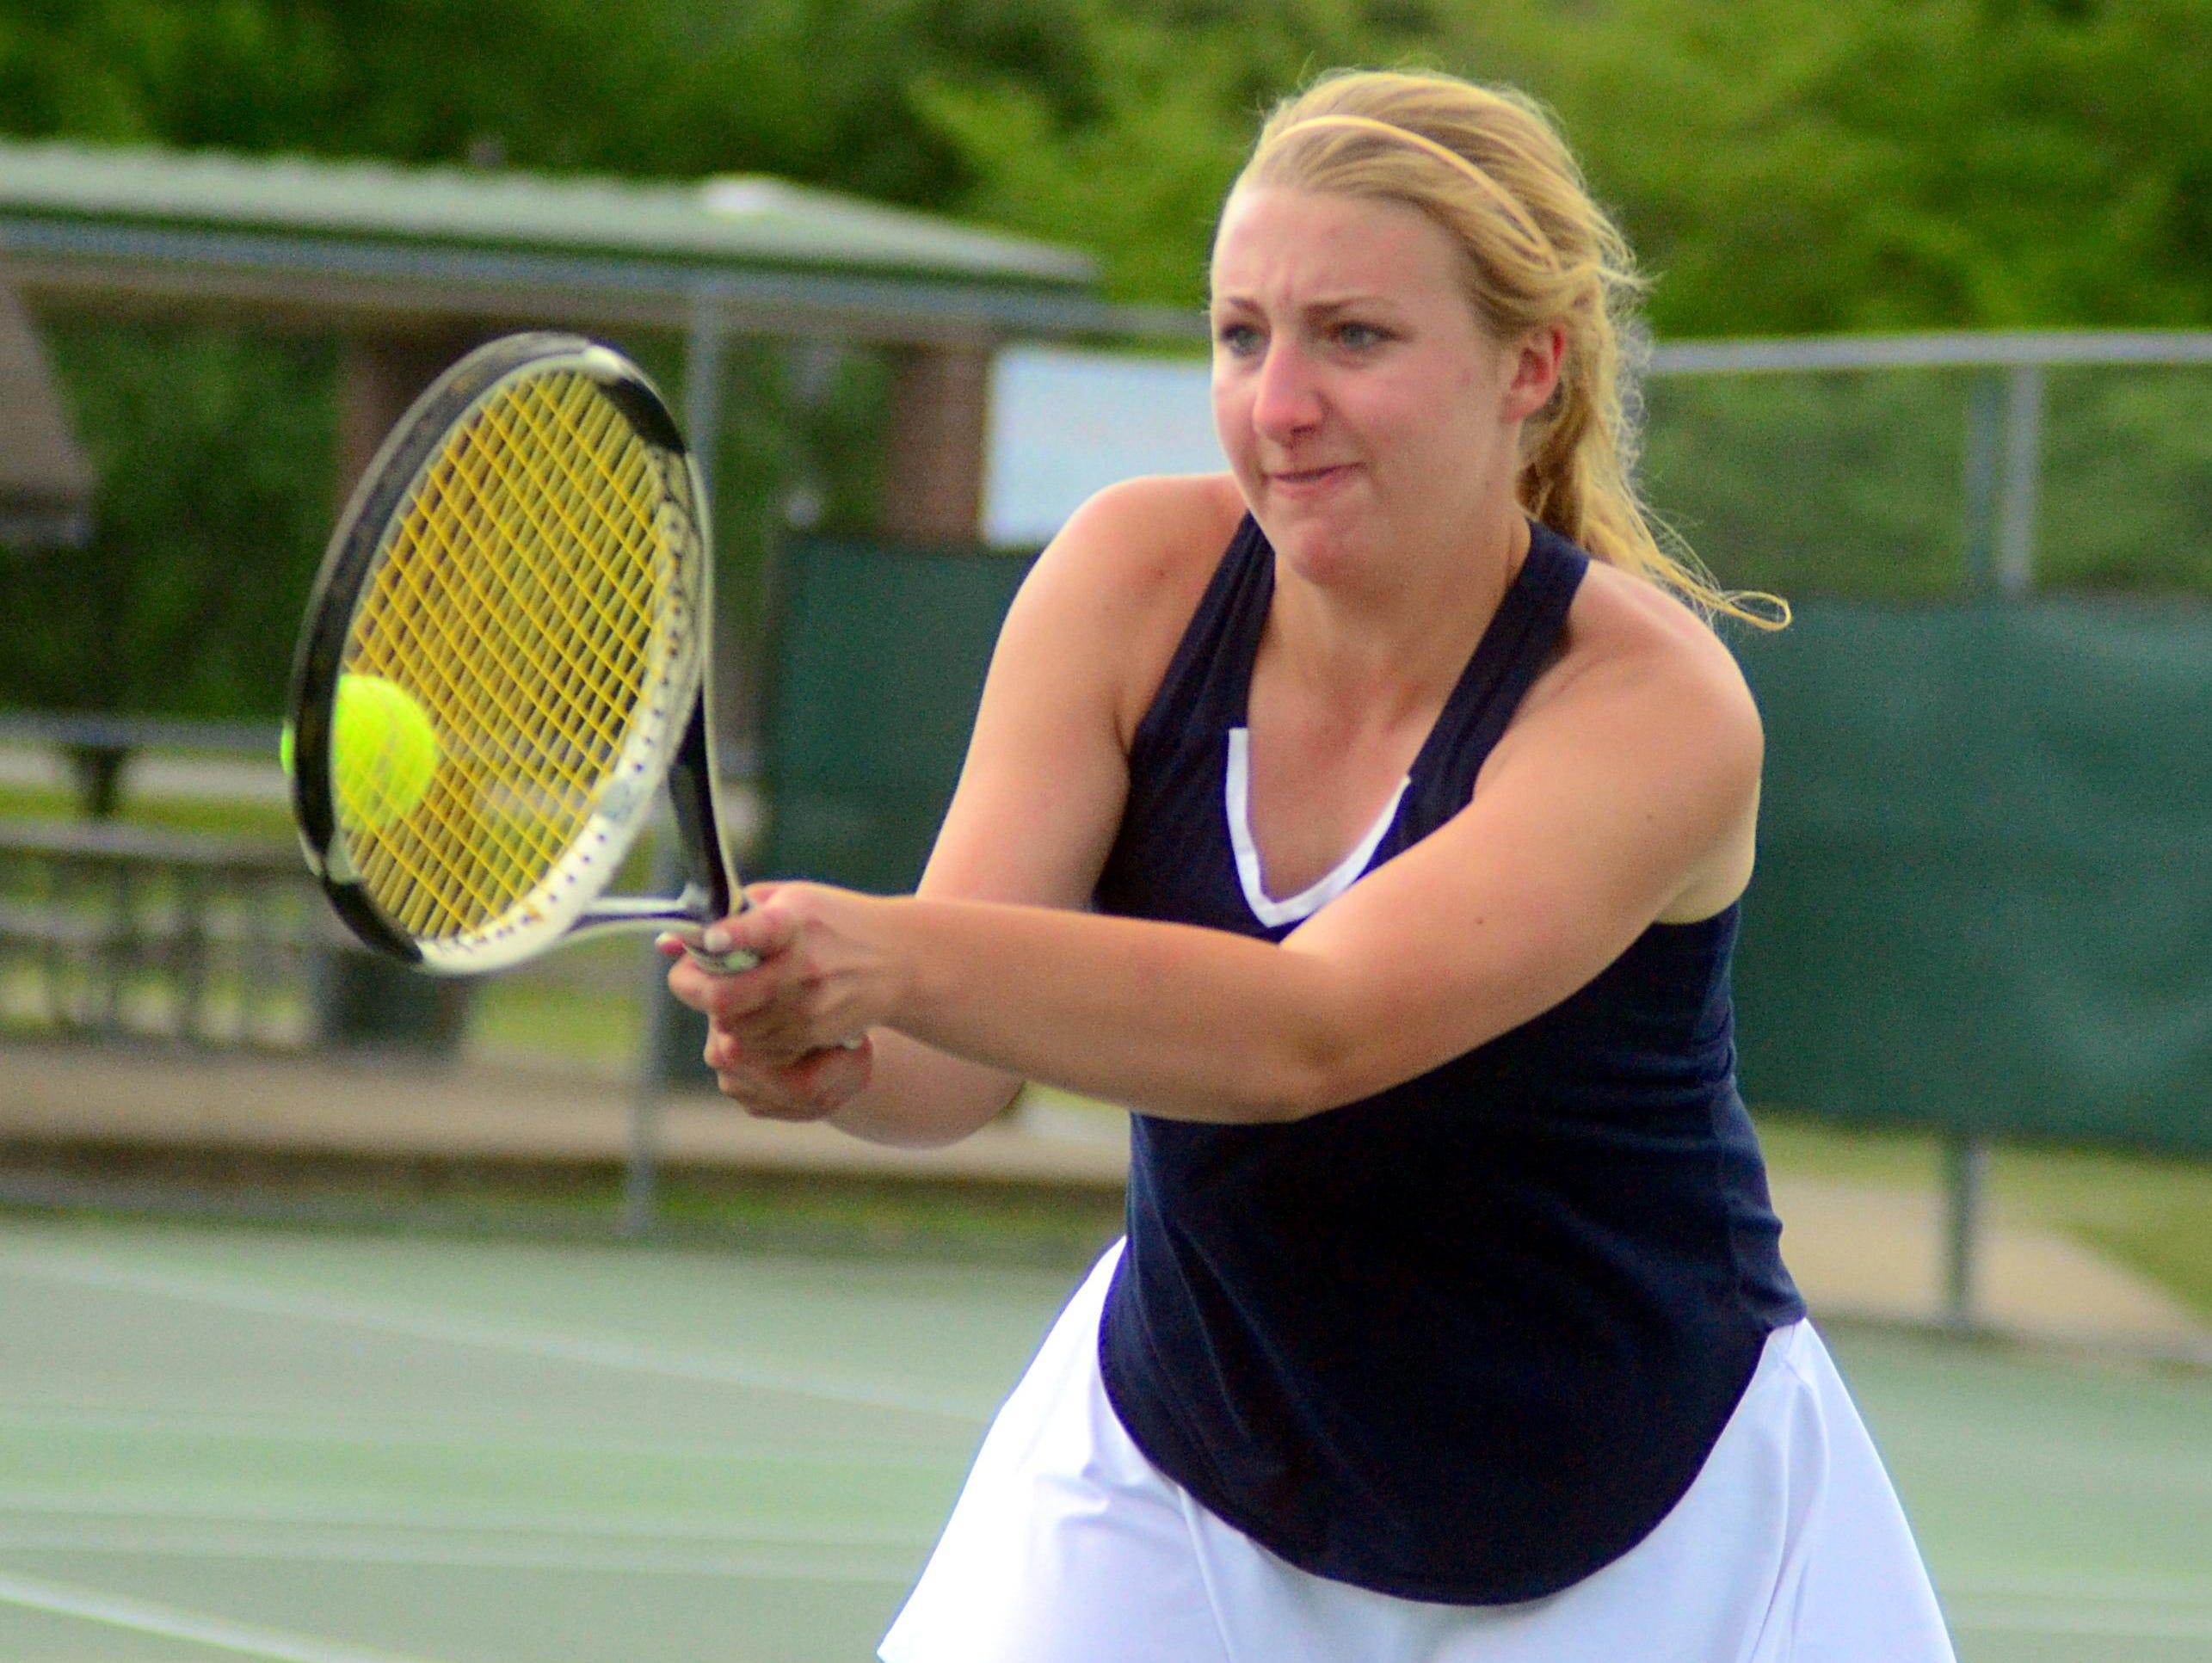 Beech High senior Allie Guinn volleys at the net during Wednesday's doubles semifinals.